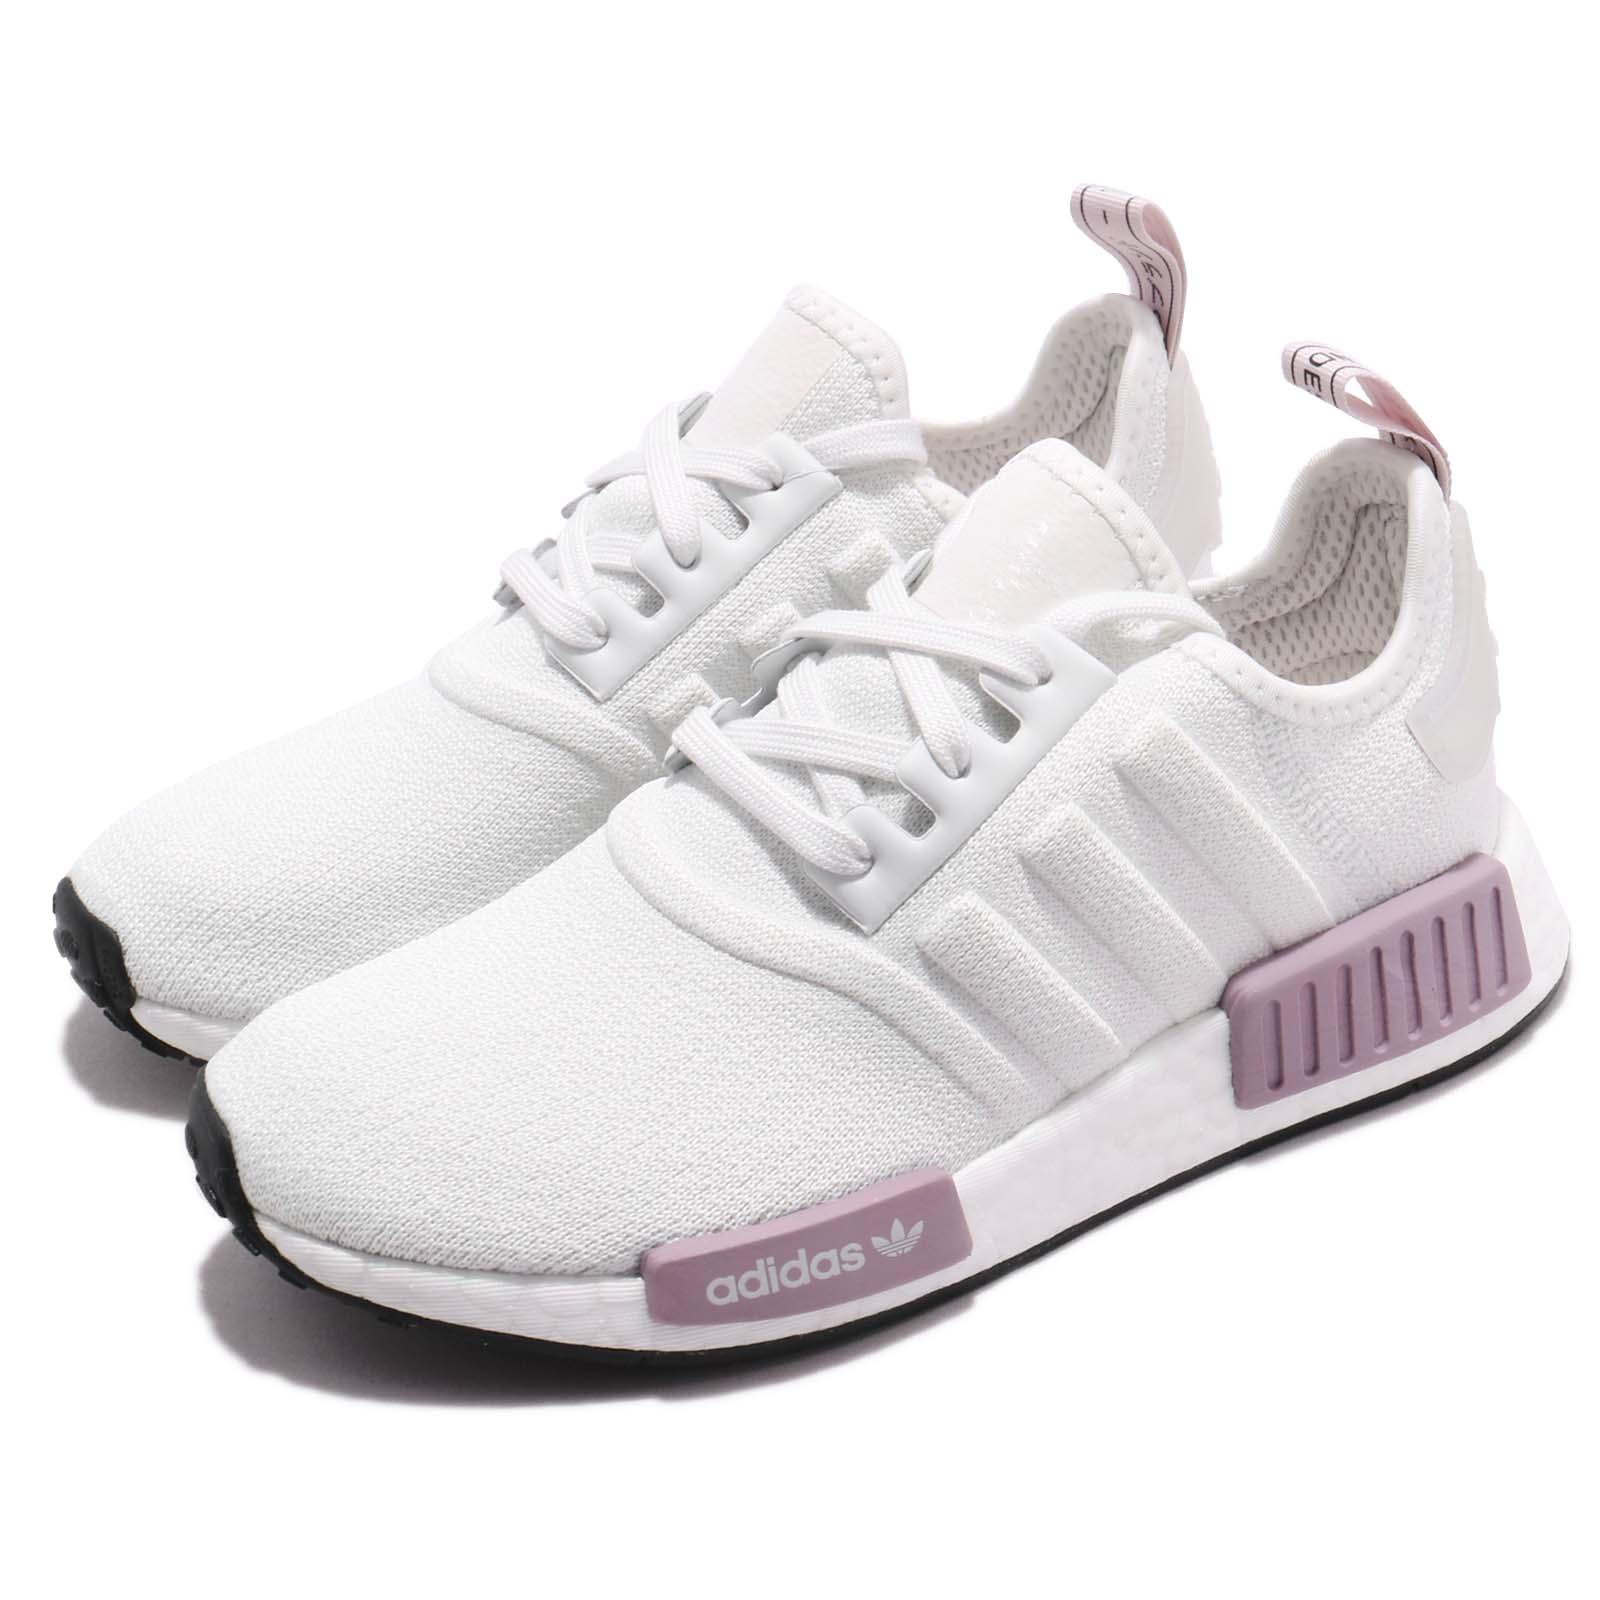 【ADIDAS】NMD_R1 白紫 經典鞋 休閒鞋  慢跑鞋 女 訂價5290 BD8024 (Palace store) 0